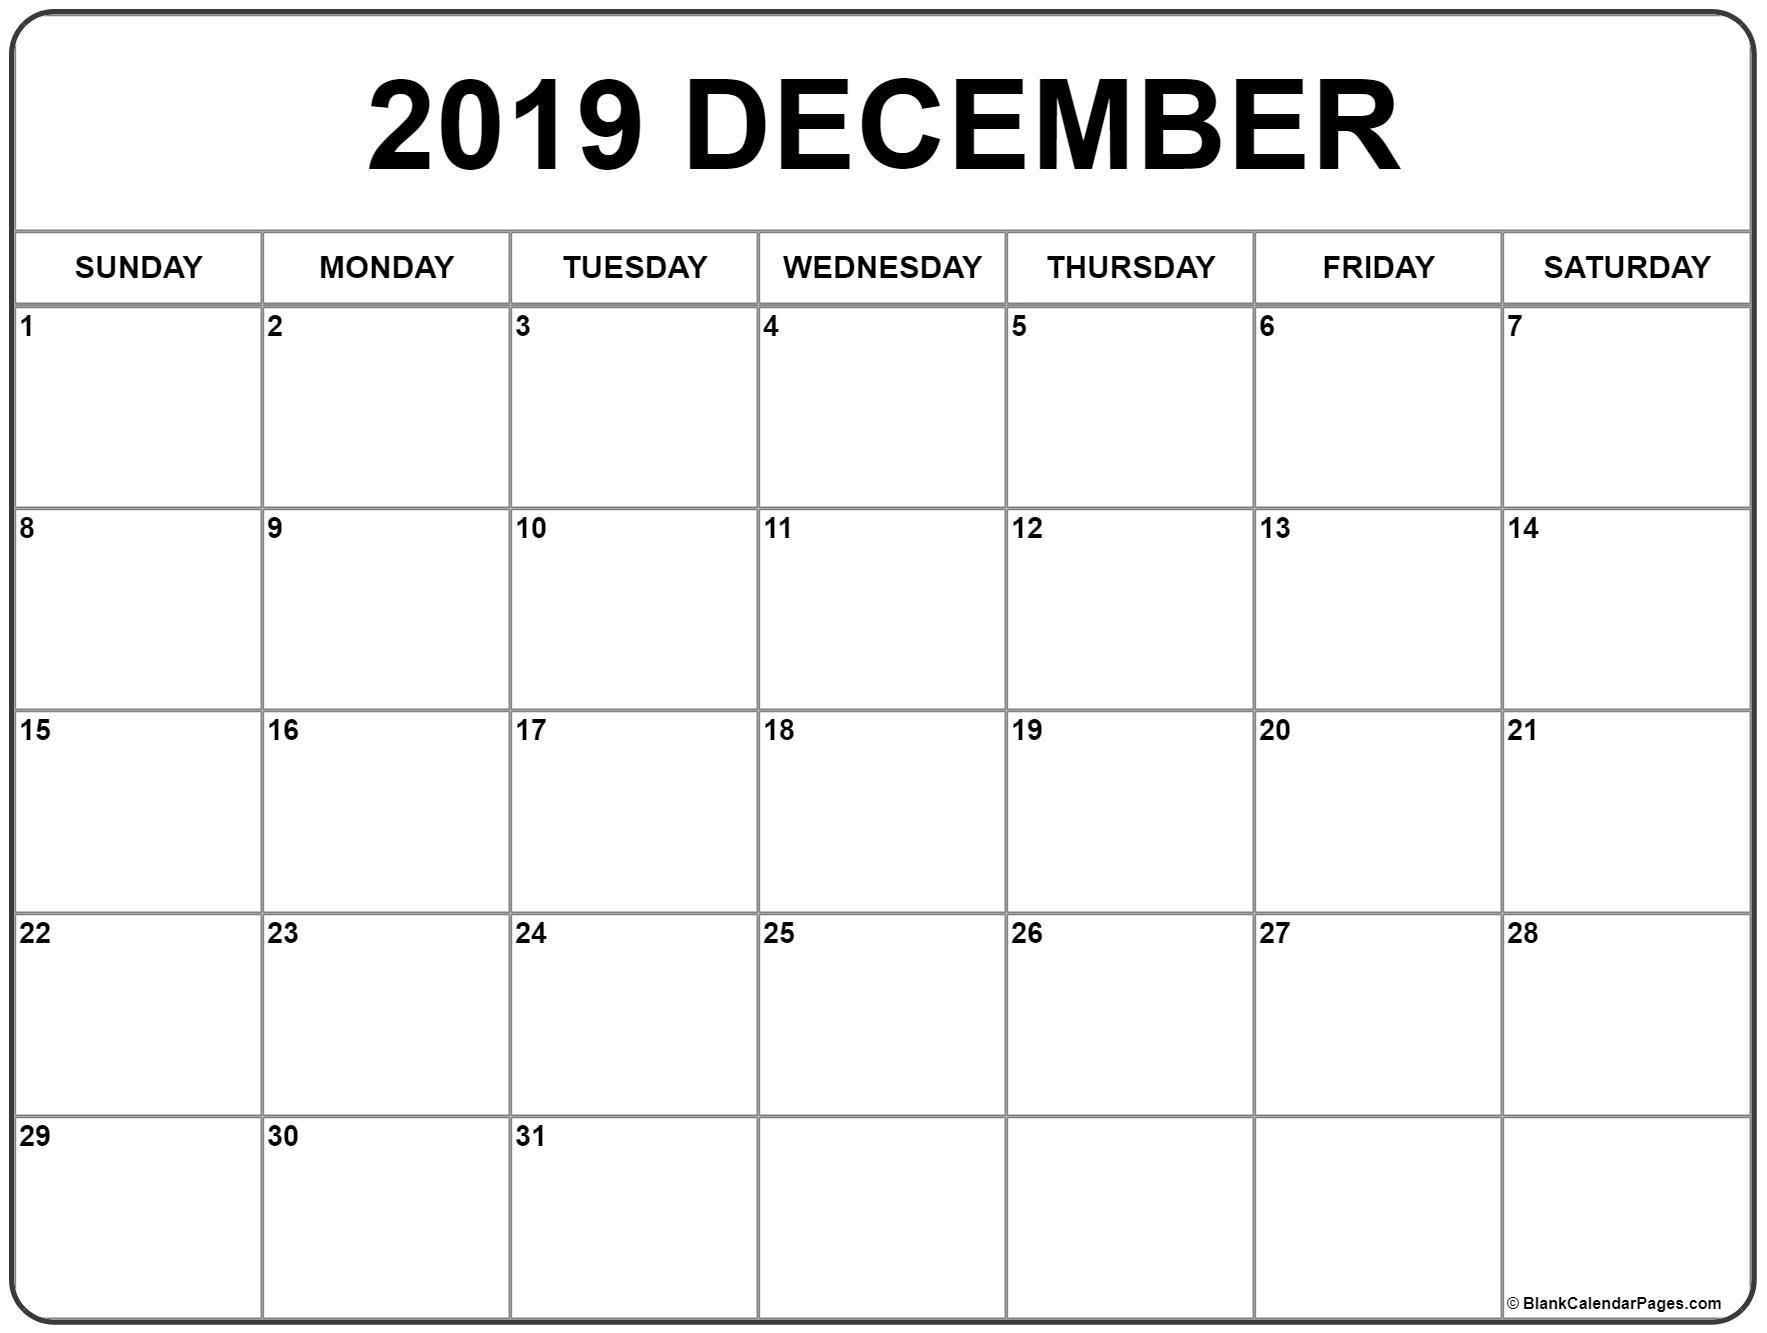 December 2019 Calendar   56+ Templates Of 2019 Printable Calendars Calendar 2019 December